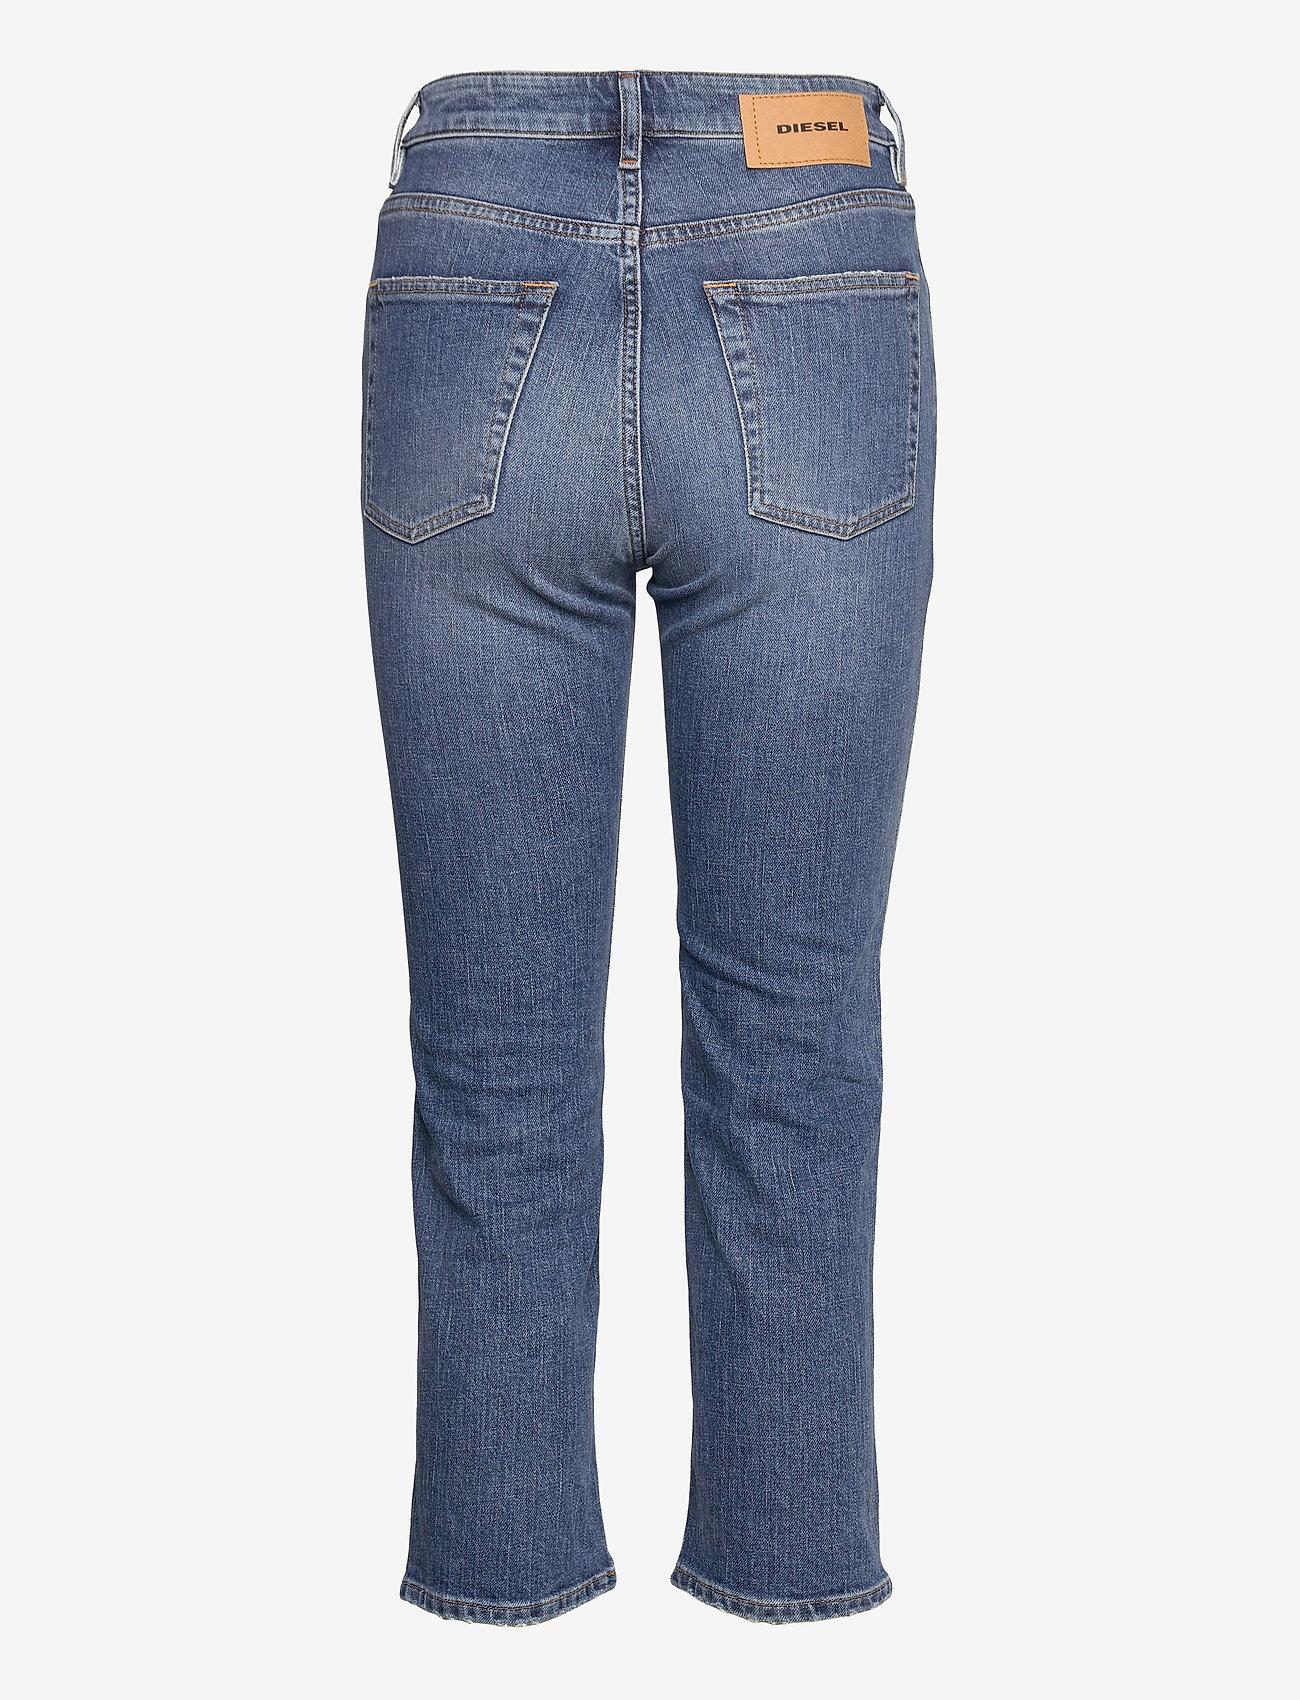 Diesel Women - D-ARYEL  L.30 TROUSERS - straight jeans - denim - 1